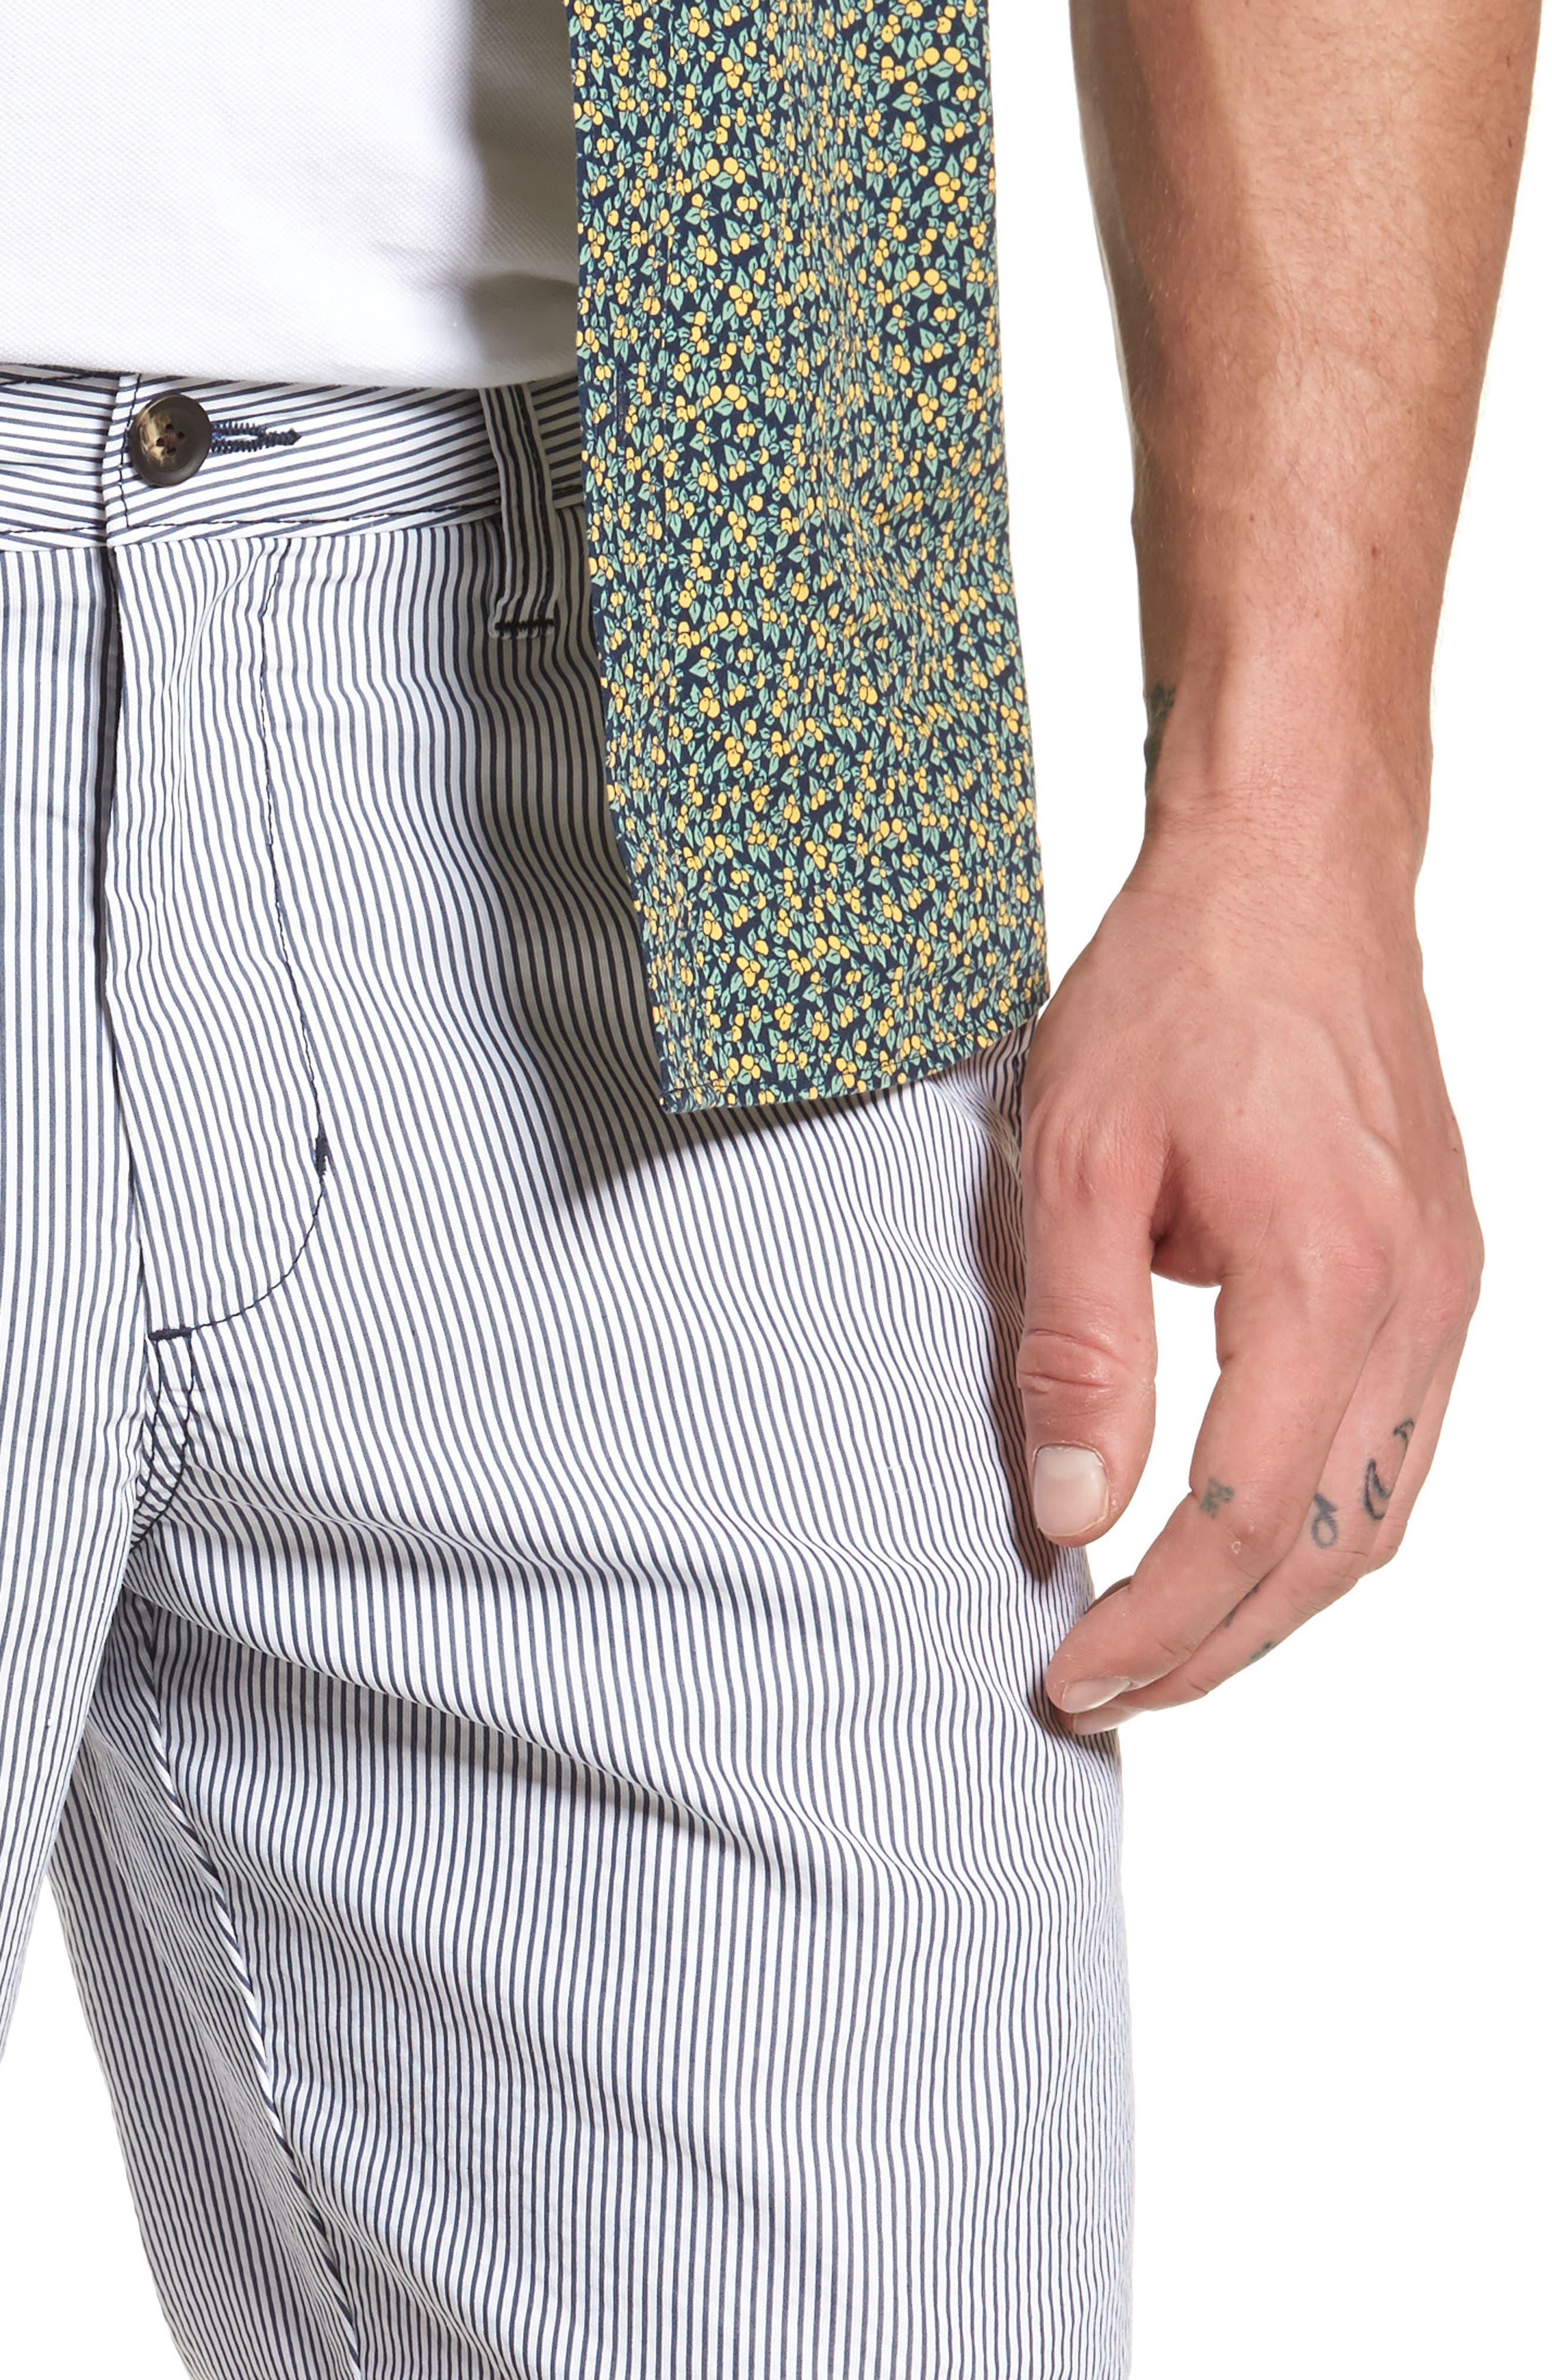 Ballard Slim Fit Seersucker Shorts,                             Alternate thumbnail 4, color,                             410